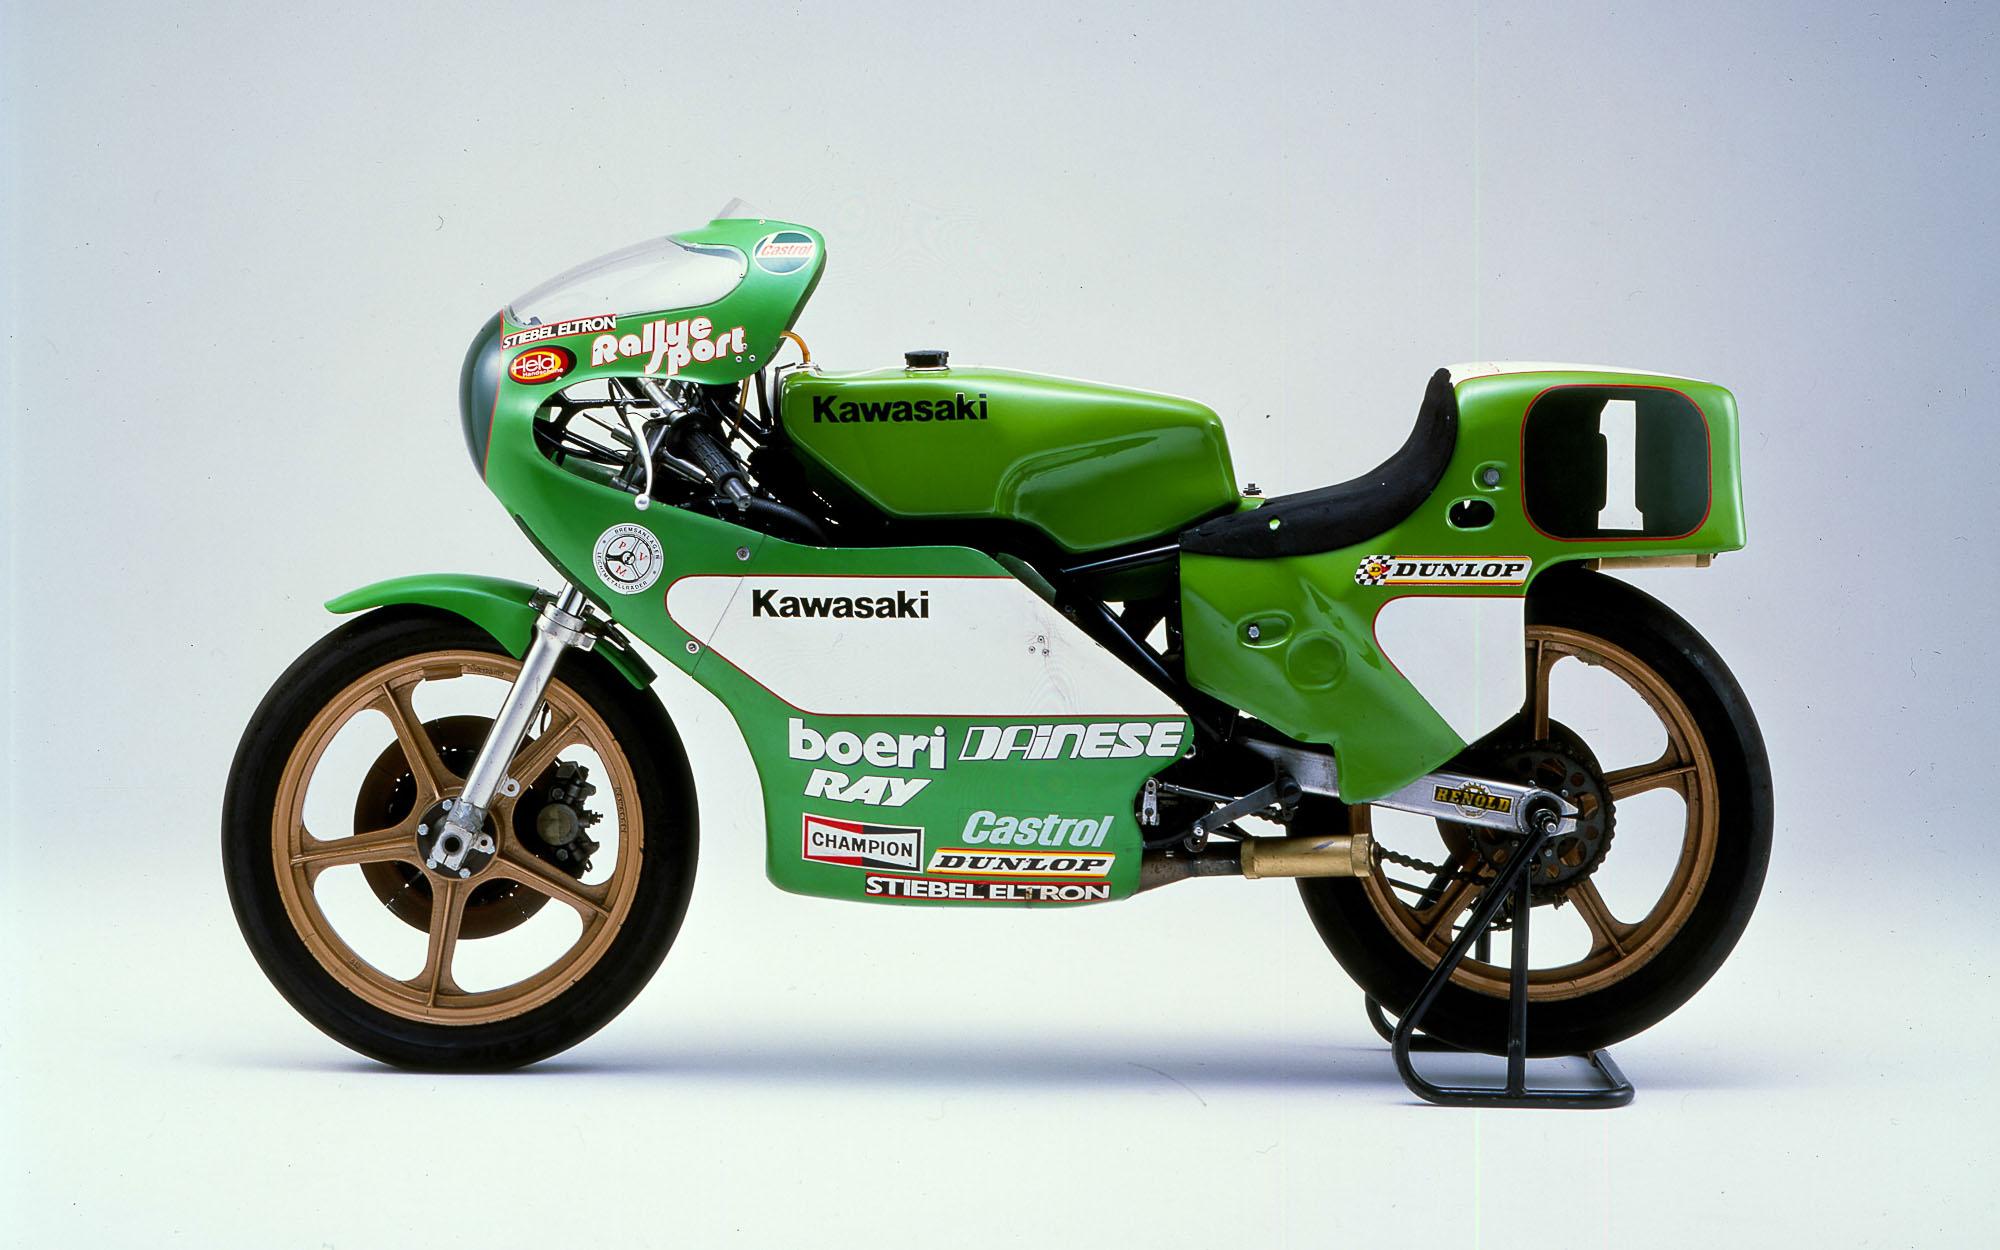 Toni Mang übergab 2016 seine Weltmeister Kawasaki KR 250 an den P.S. Speicher